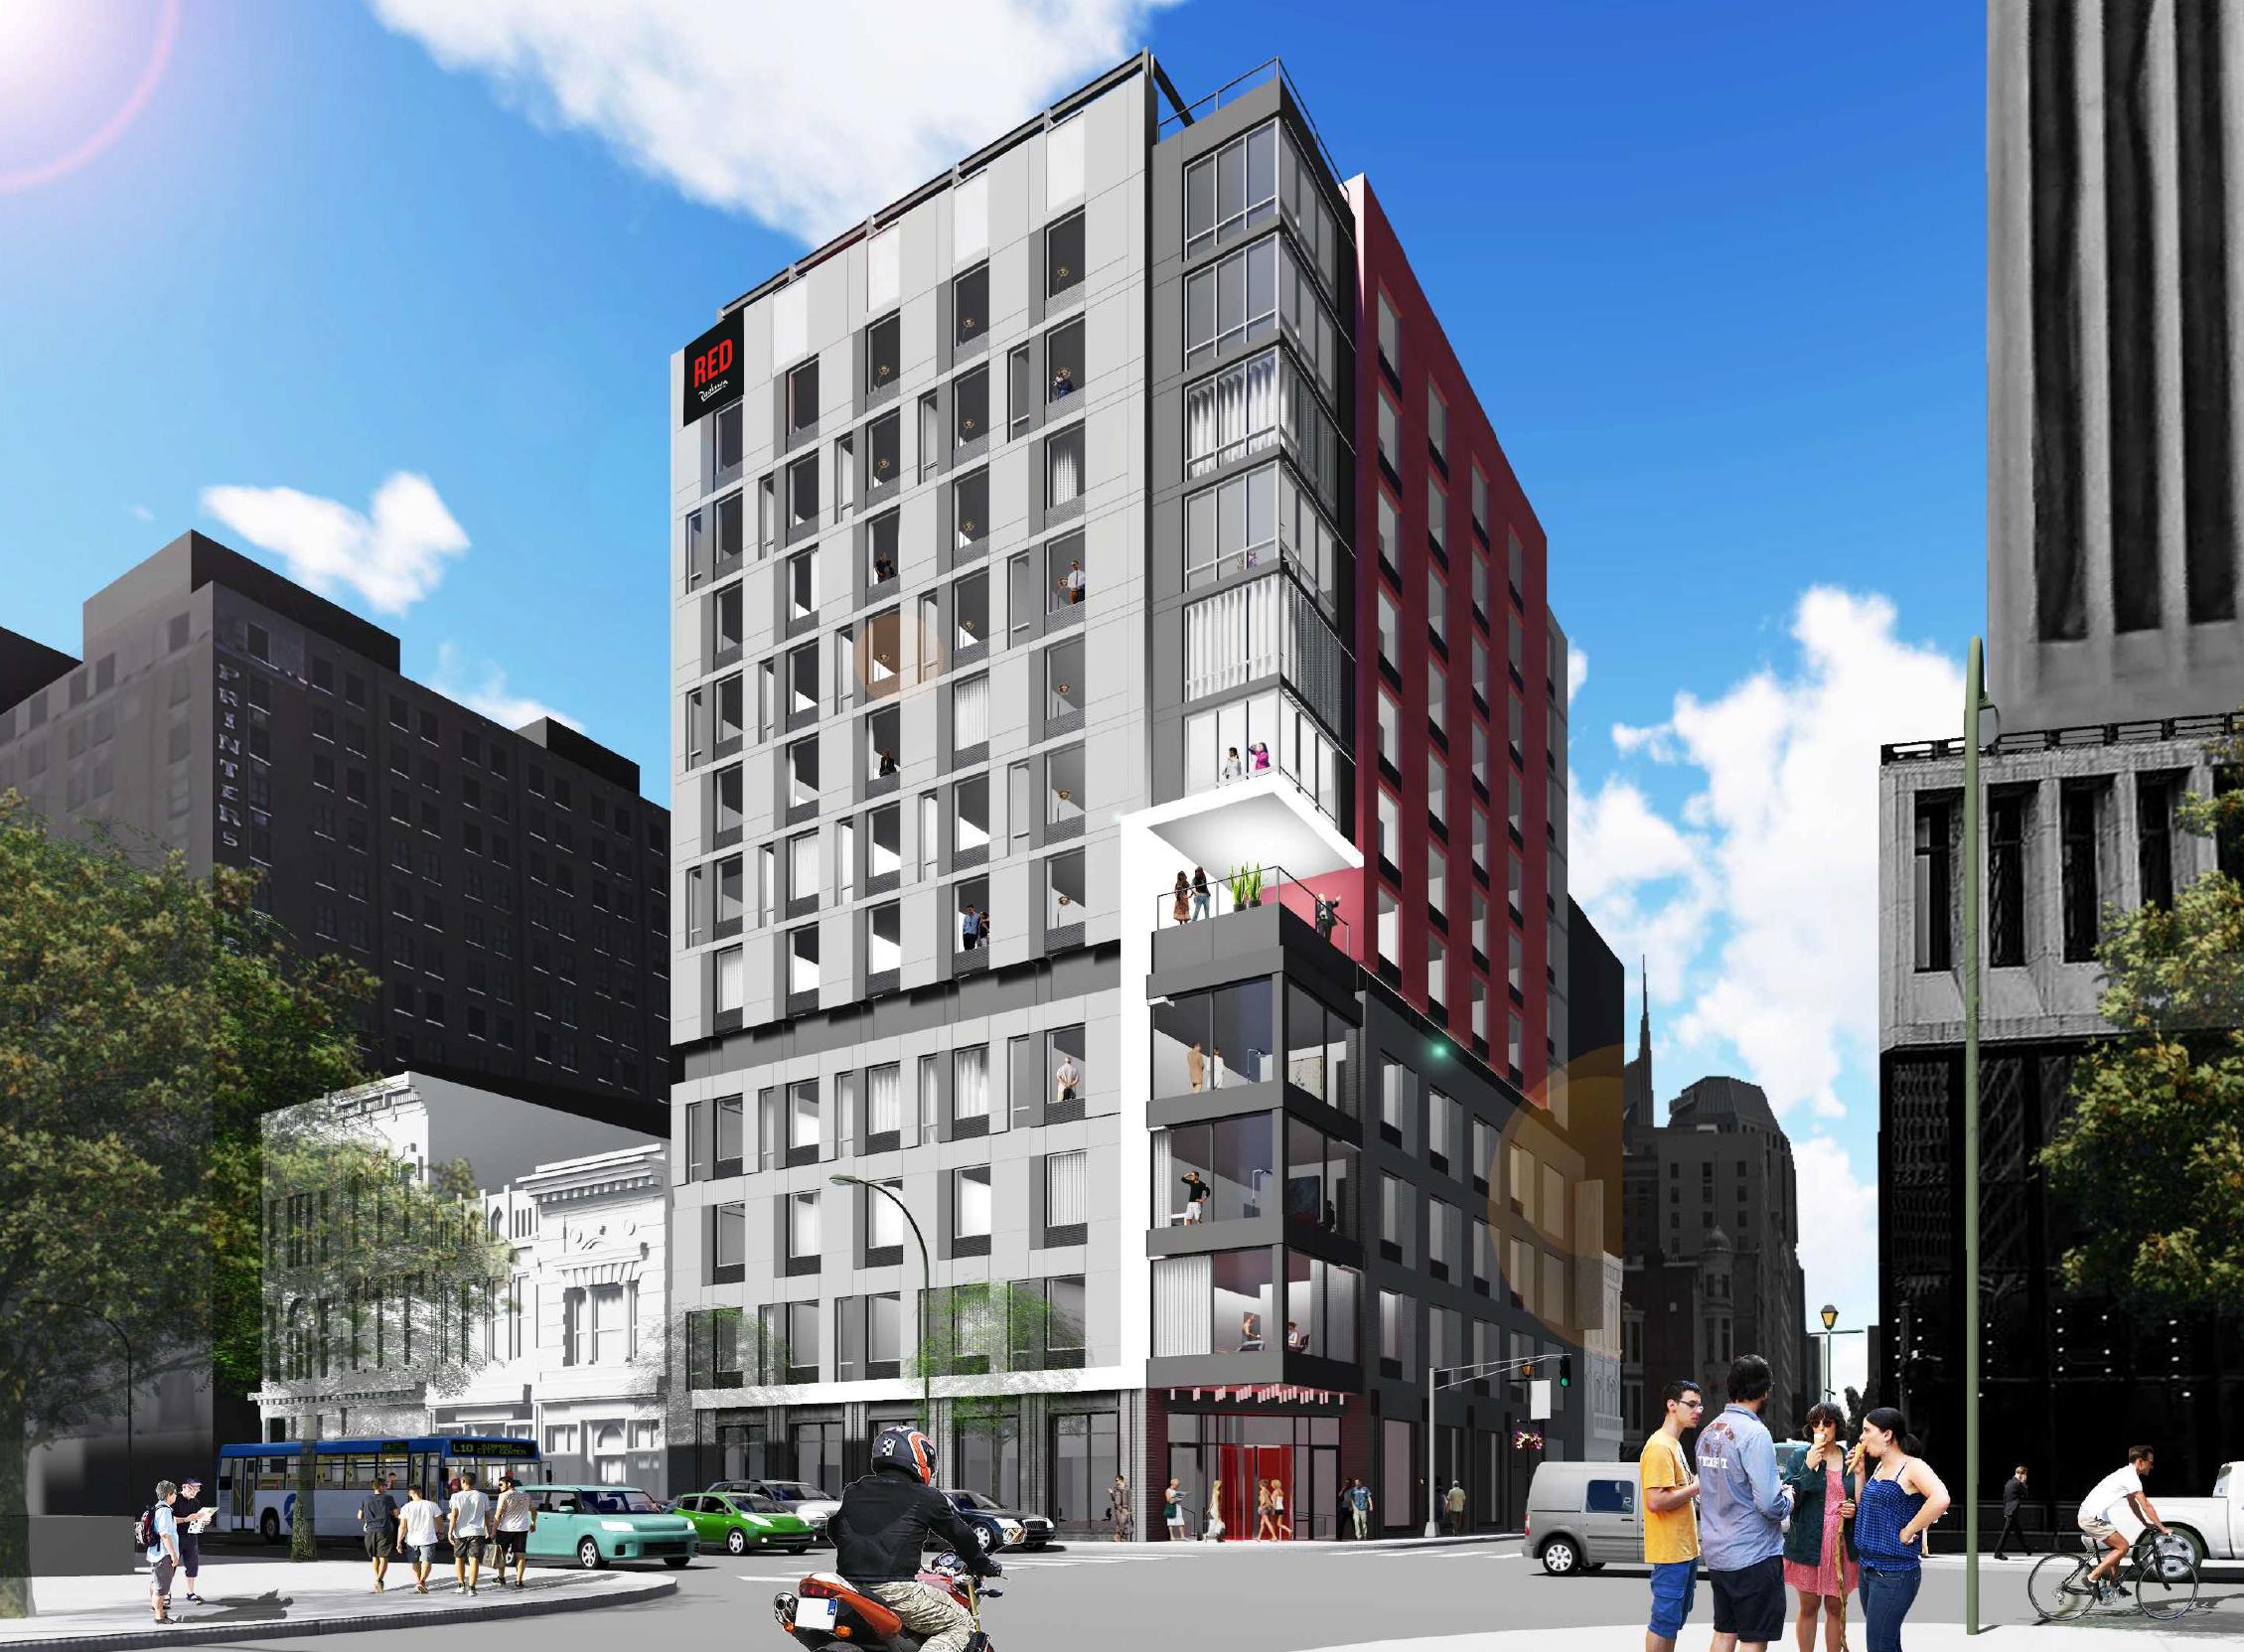 Radisson makes major push into US hotel market [Construction Report]